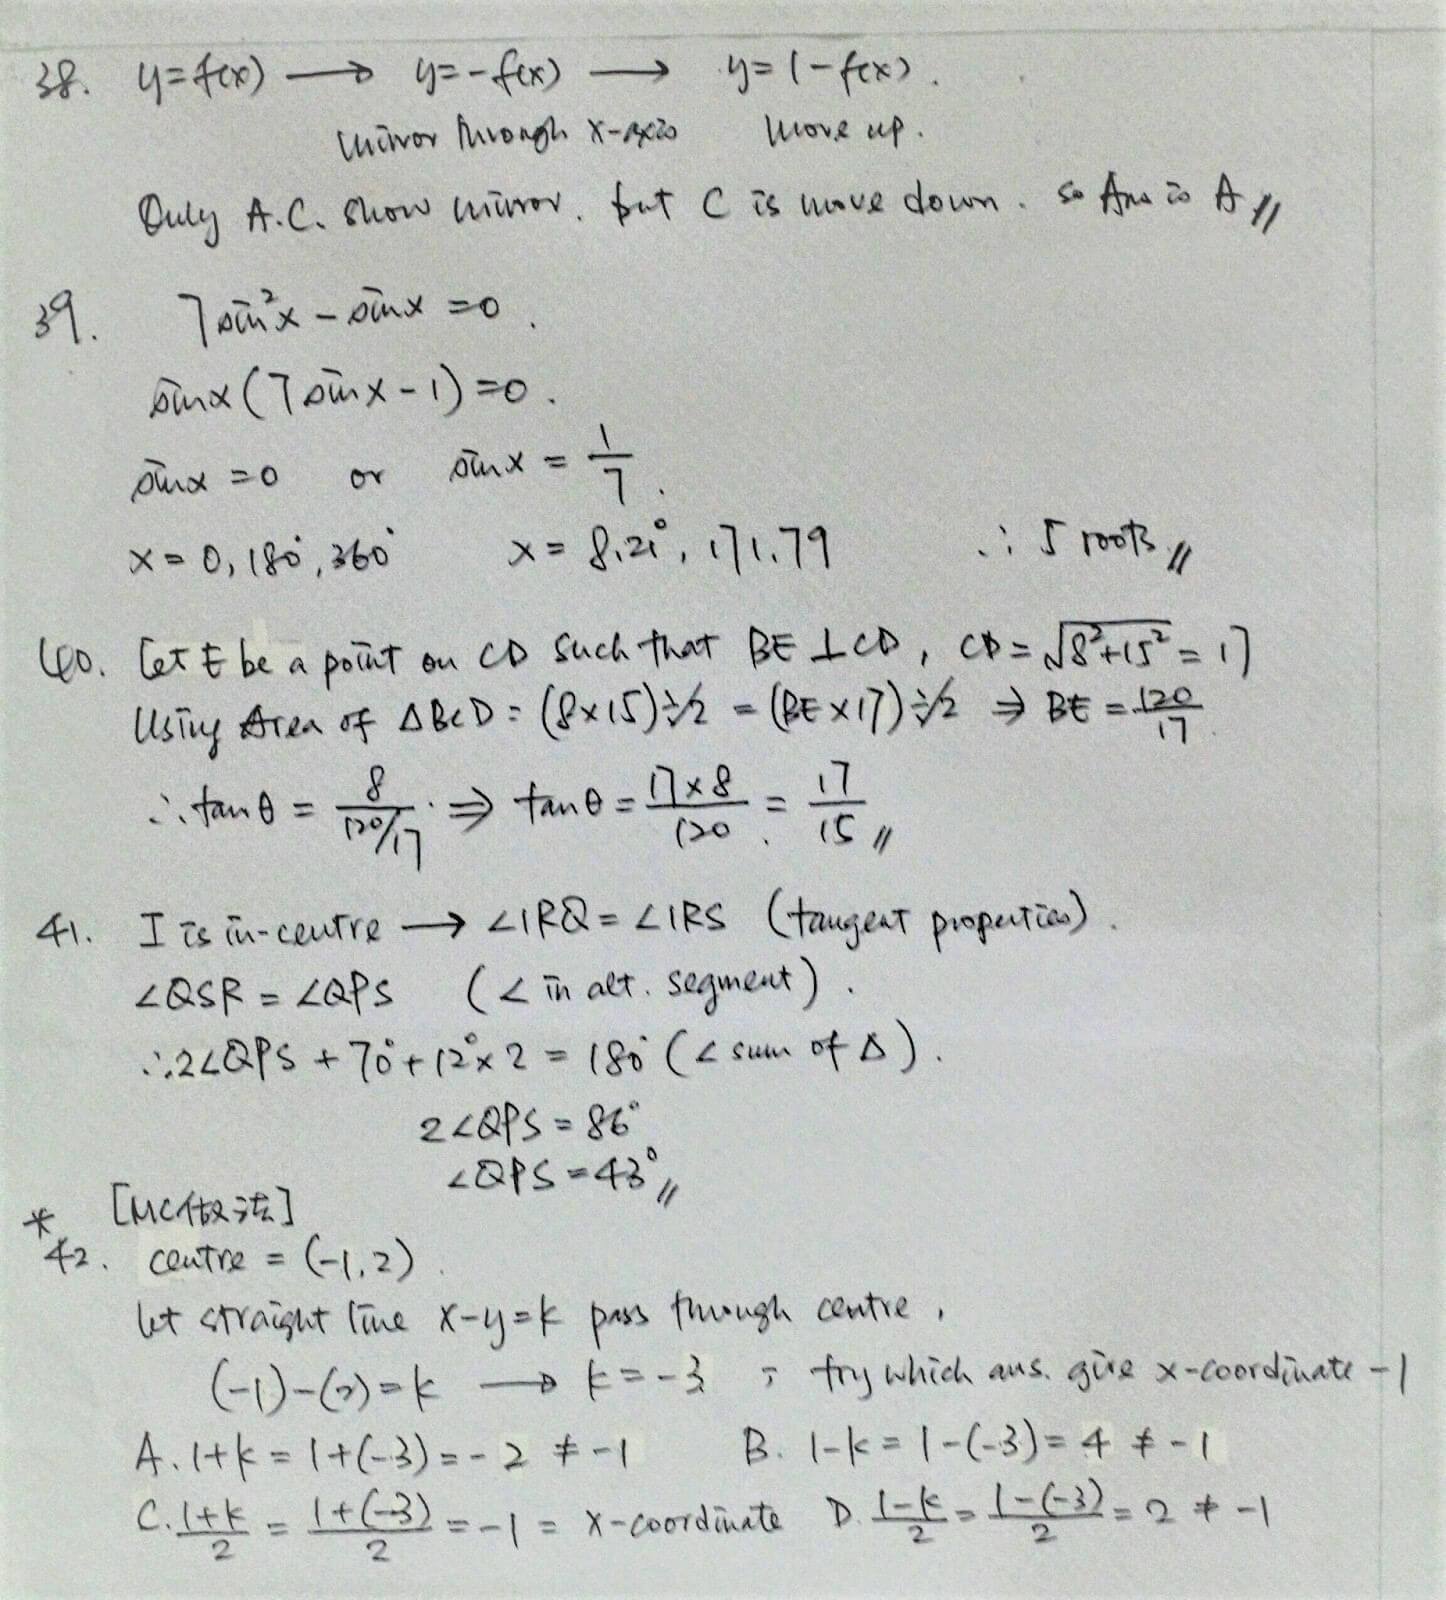 2014 DSE Math 數學 卷二 P2 Q38,39,40,41,42